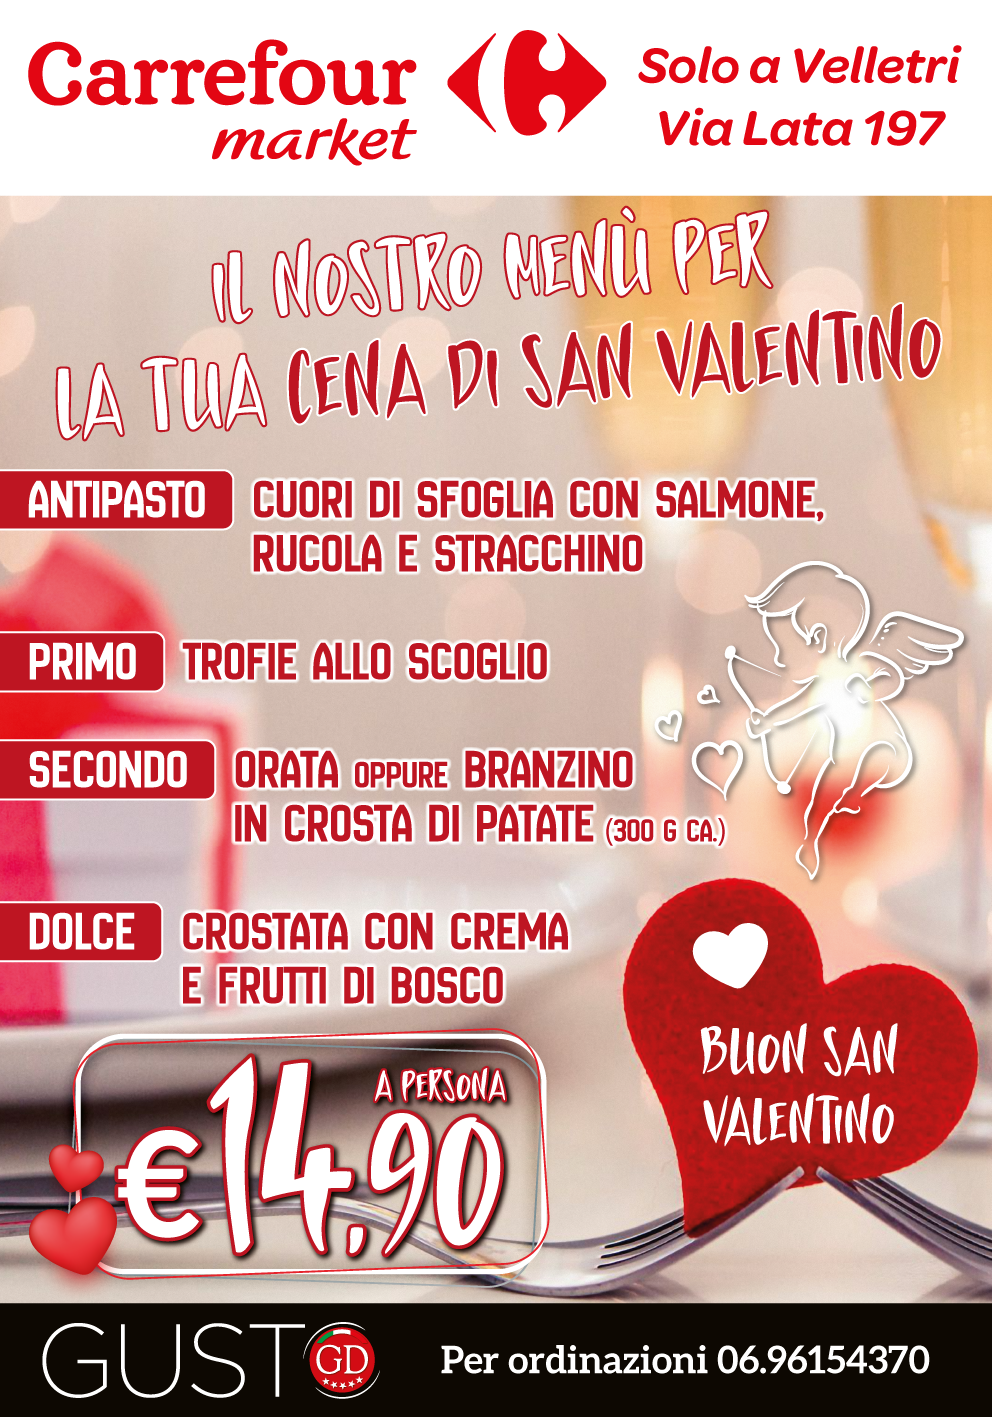 gusto-gd_velletri-via-lata_tavola-calda-pinseria-san-valentino